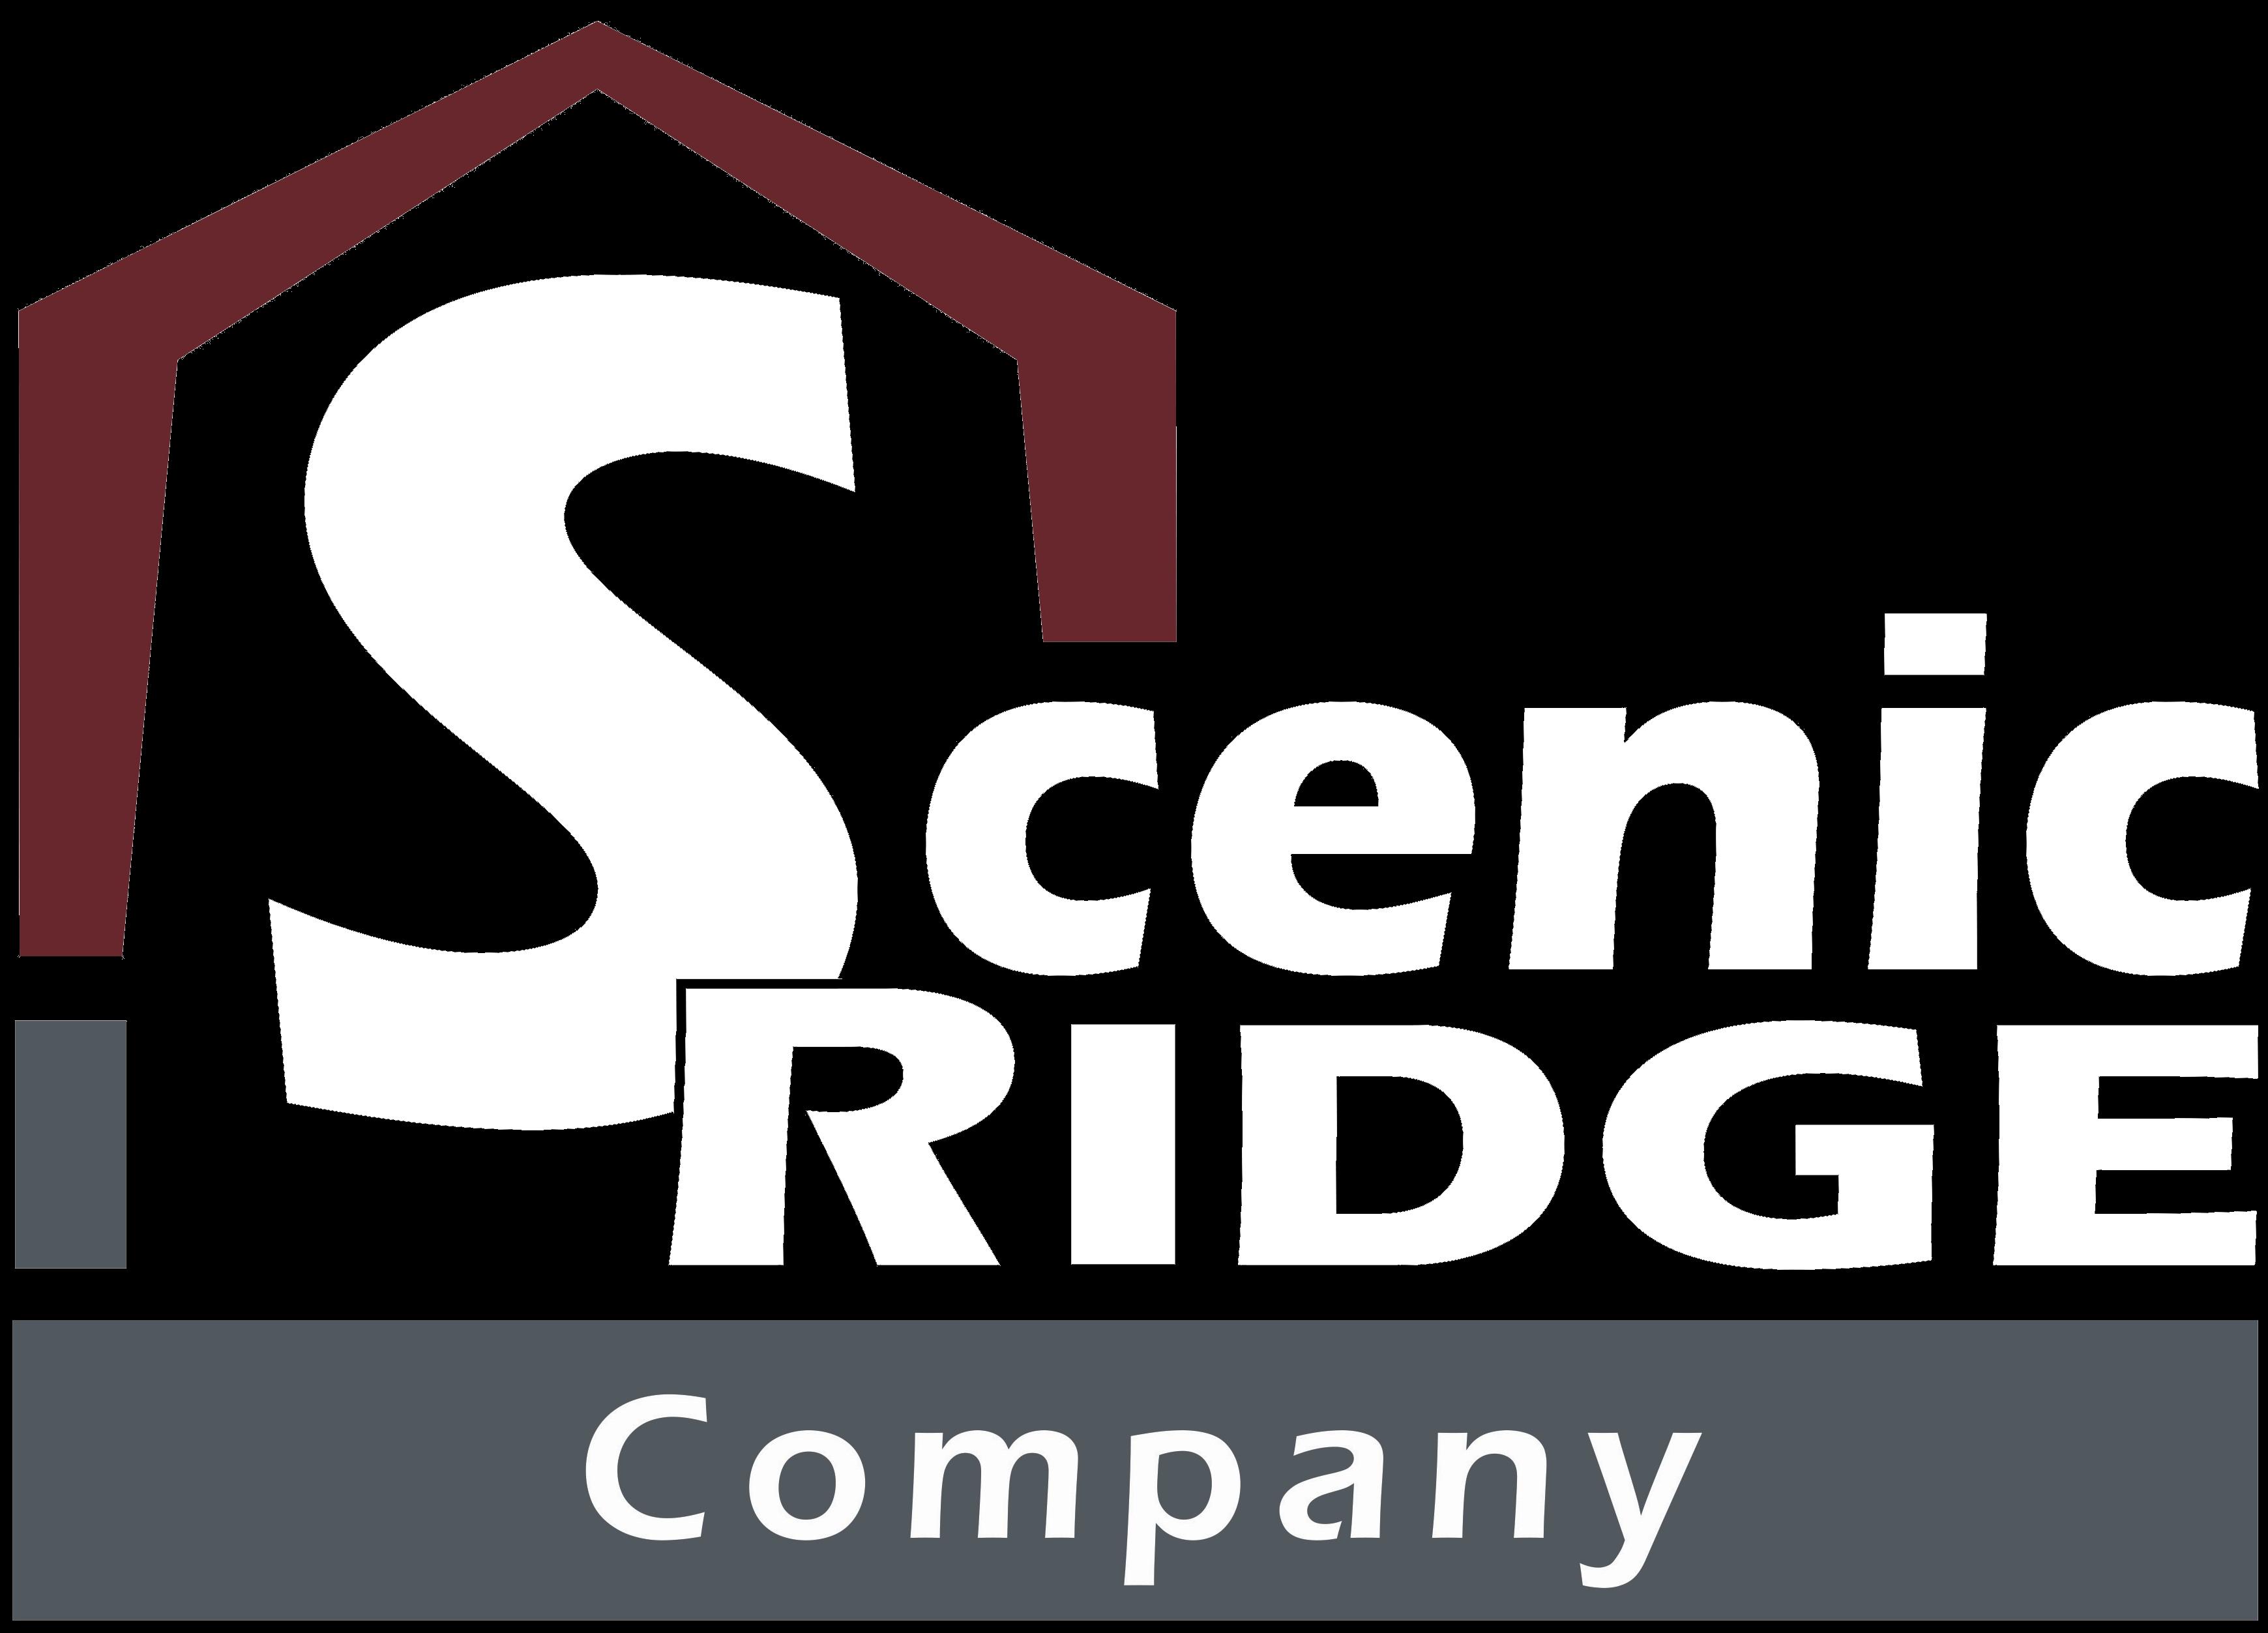 Scenic Ridge Company